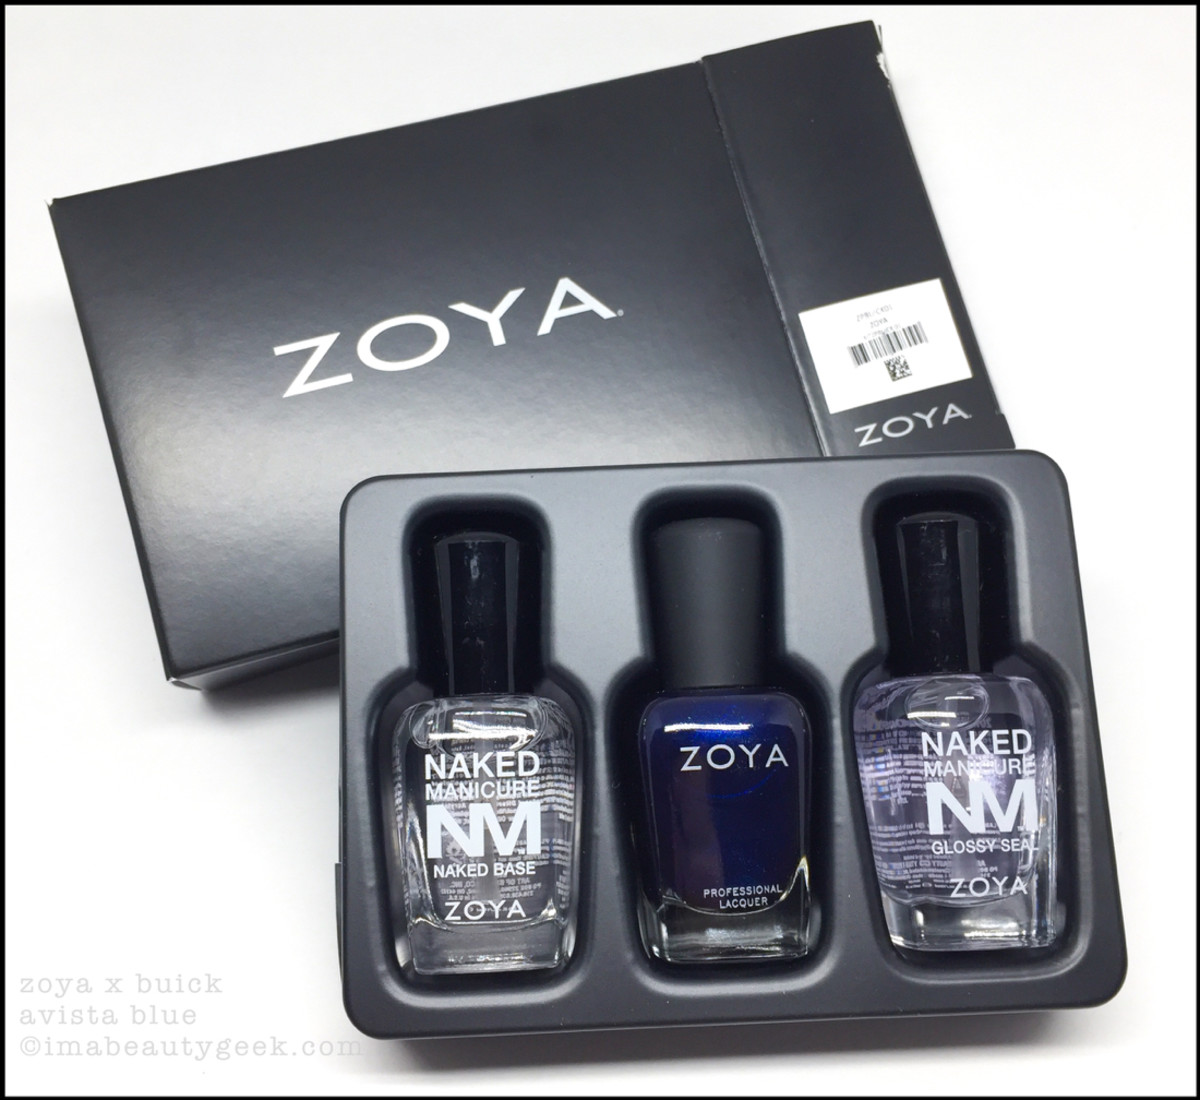 Zoya Giveaway Avista Blue Nail Polish x Buick